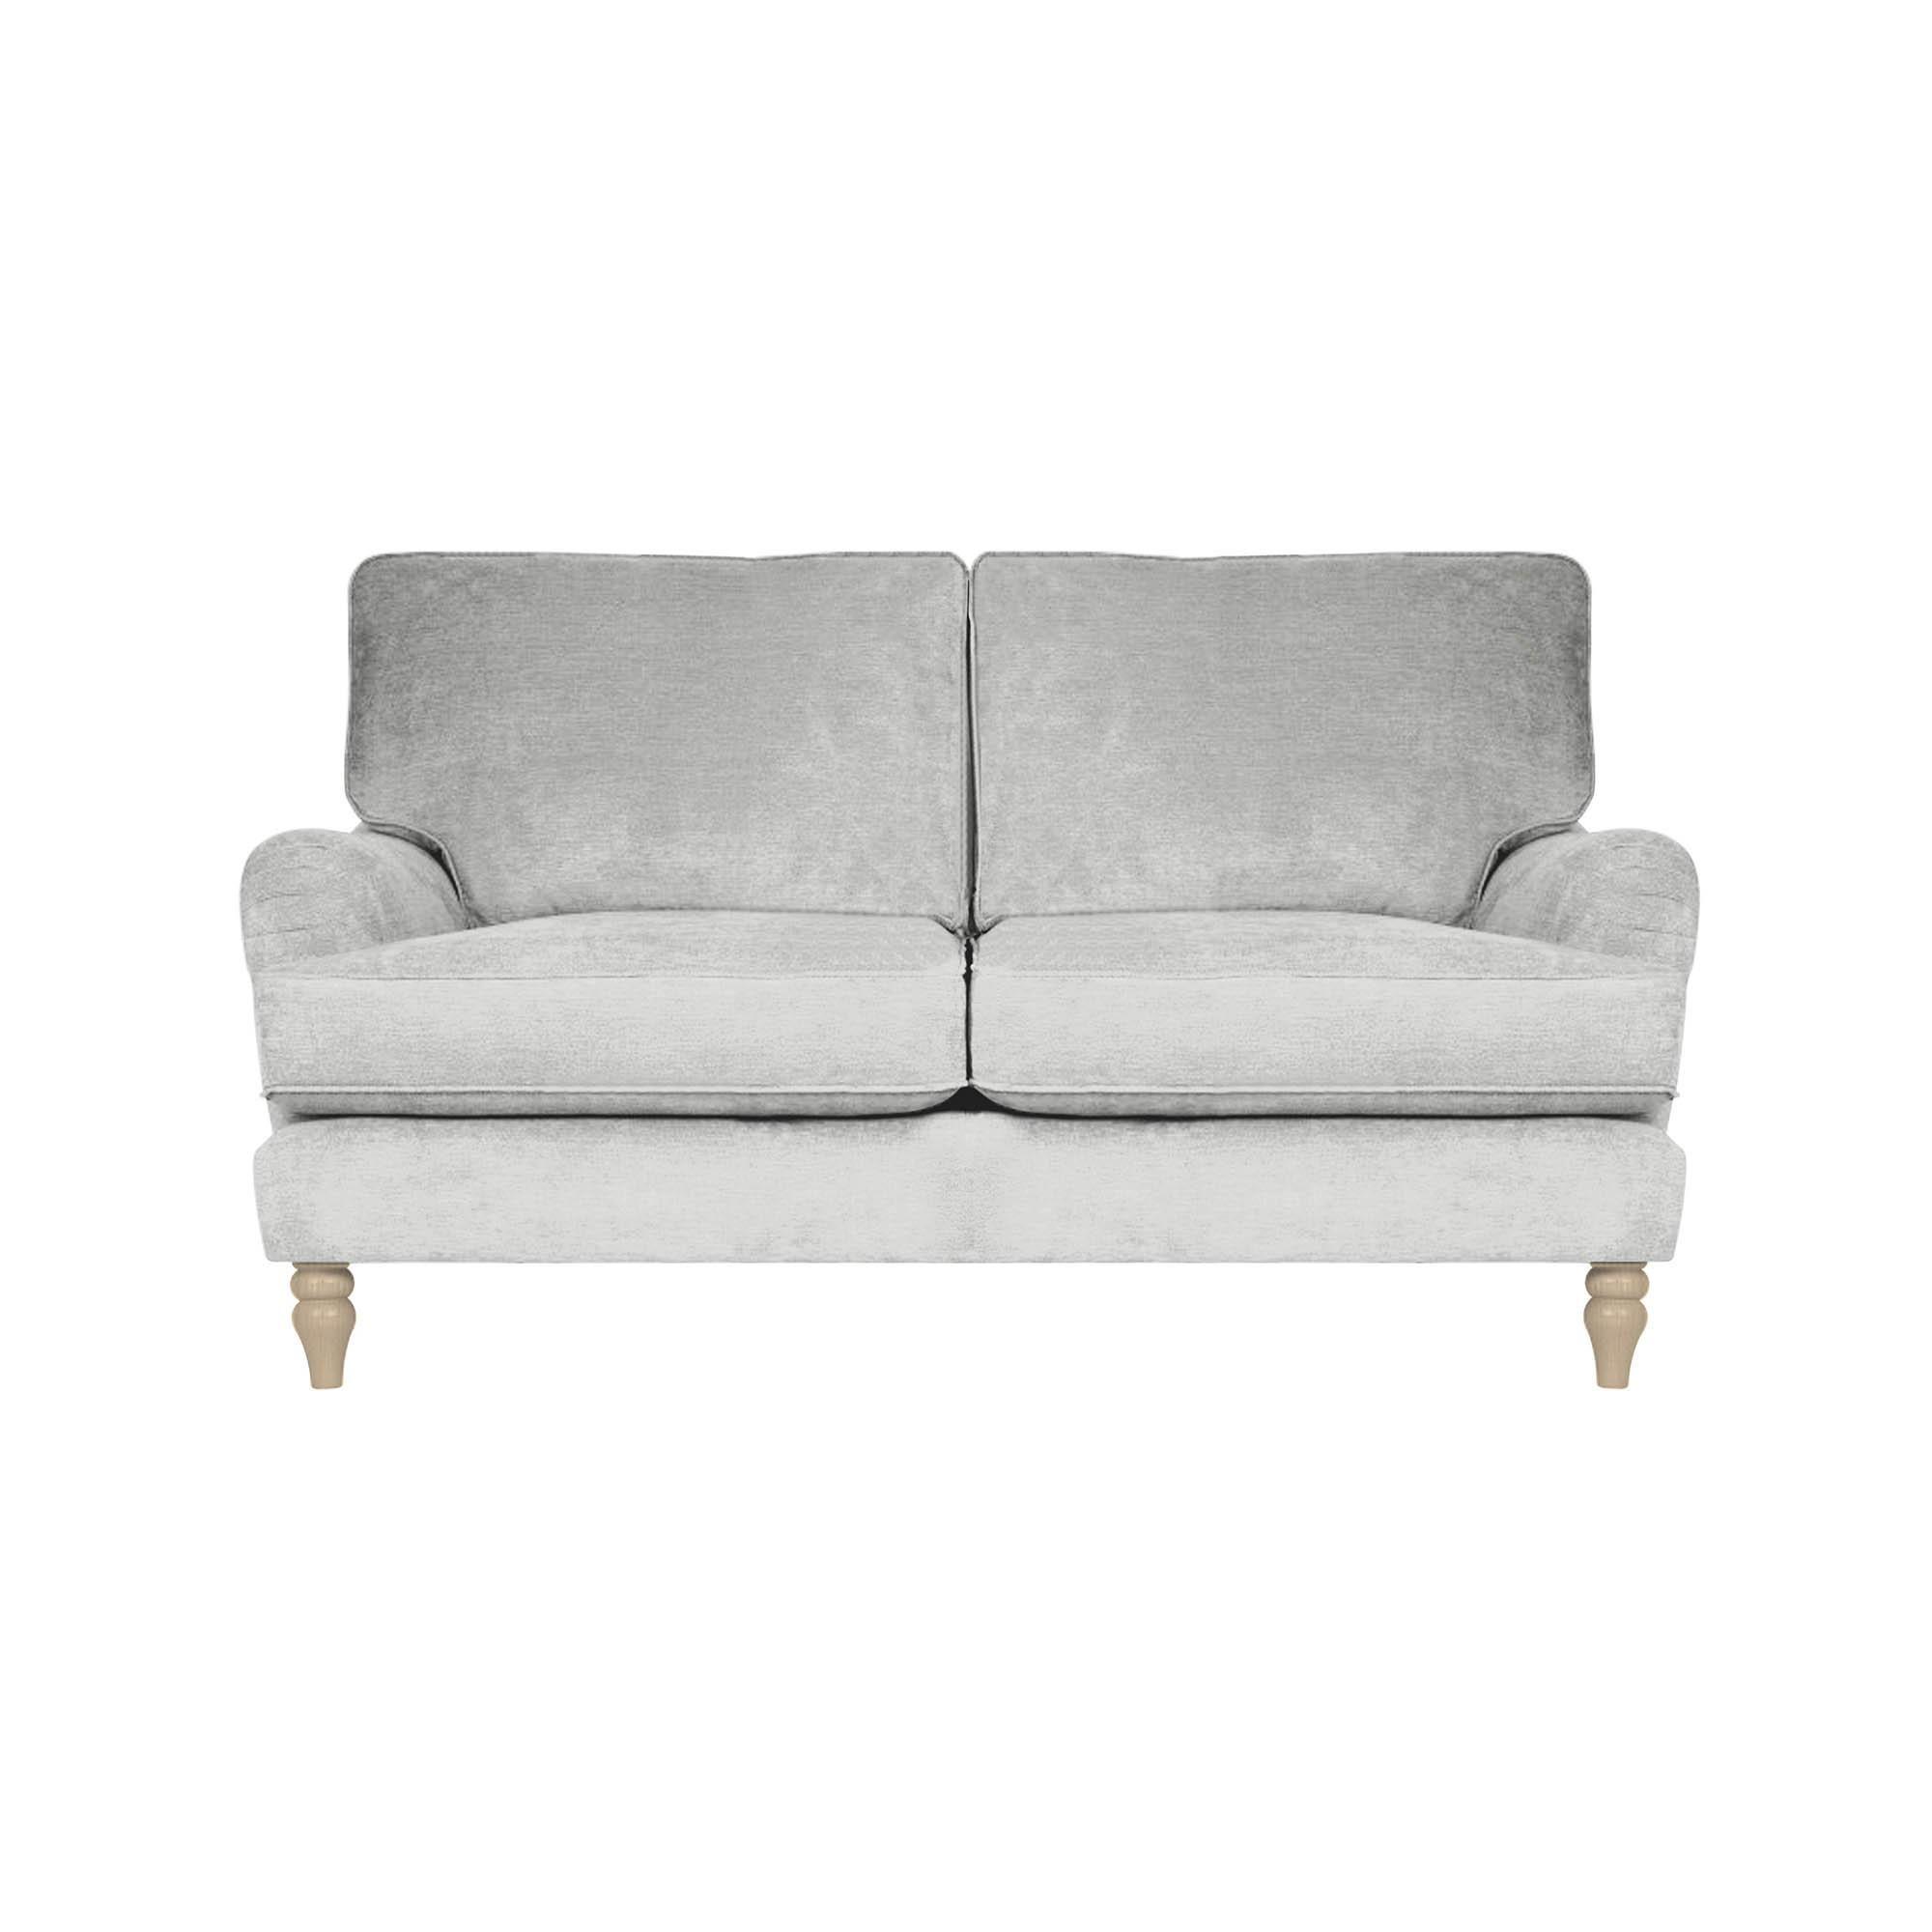 Dunelm Grey Ashby 3 Seater Compact Retro Sofa Retro Sofa Seater Sofa Comfortable Sofa Bed